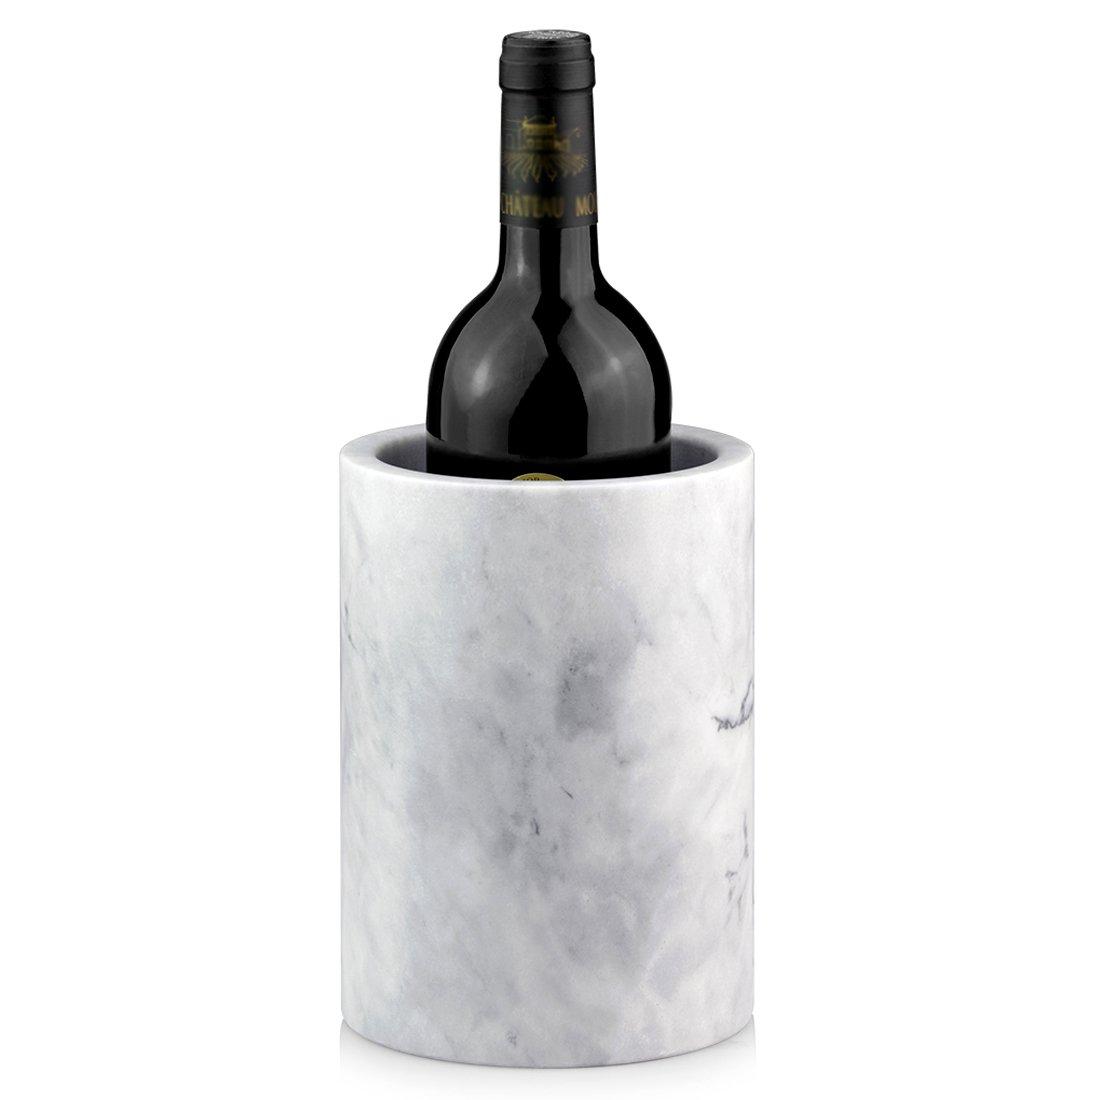 Linkidea Elegant Wine Cooler, Champagne Chiller, Ice Wine Cooler, Flower Vase, Storage Holder, Kitchen Utensil Holder Natural Marble Multi-Functional Tool Crock (White)